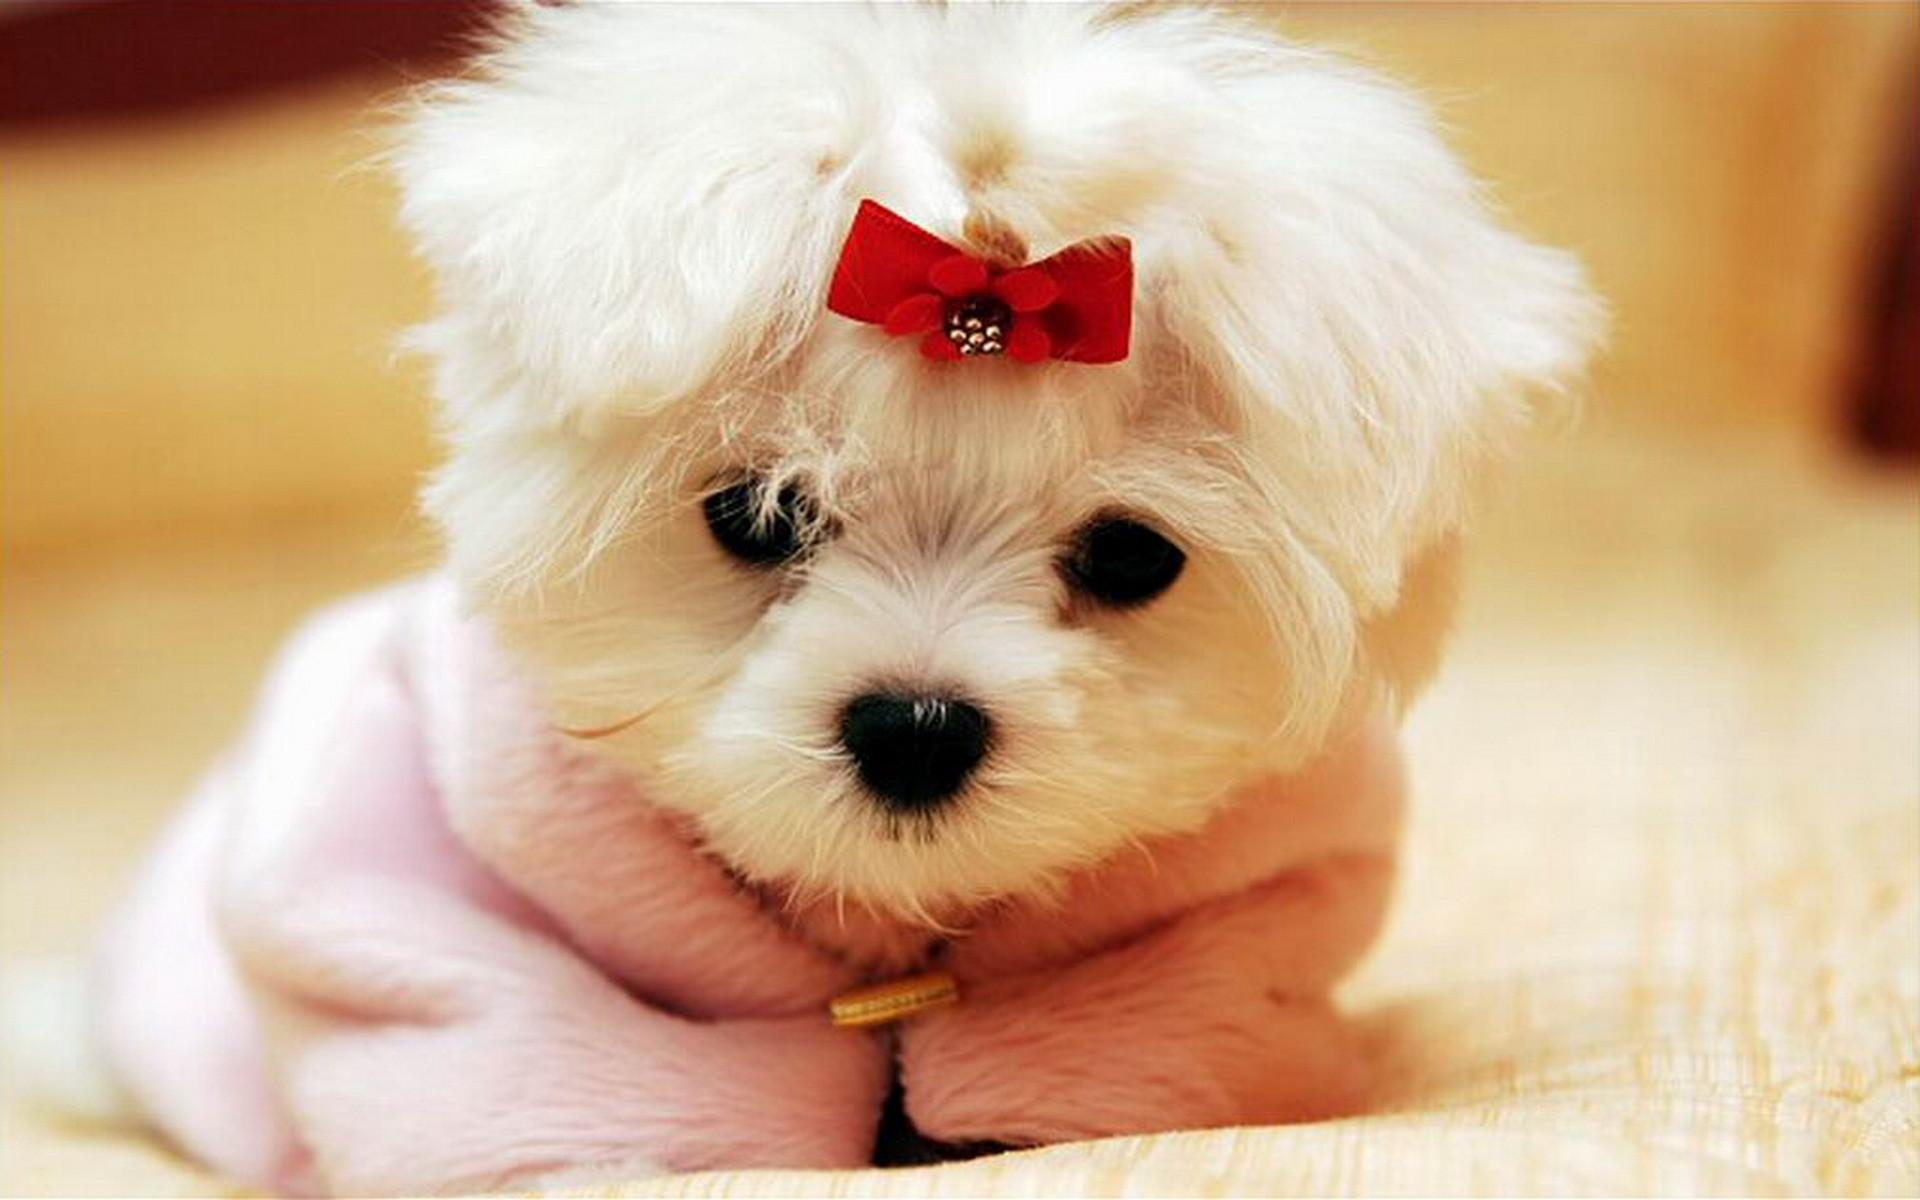 1920x1200 Yorkie Puppies Cute Dog Full Screen Wallpaper Photos